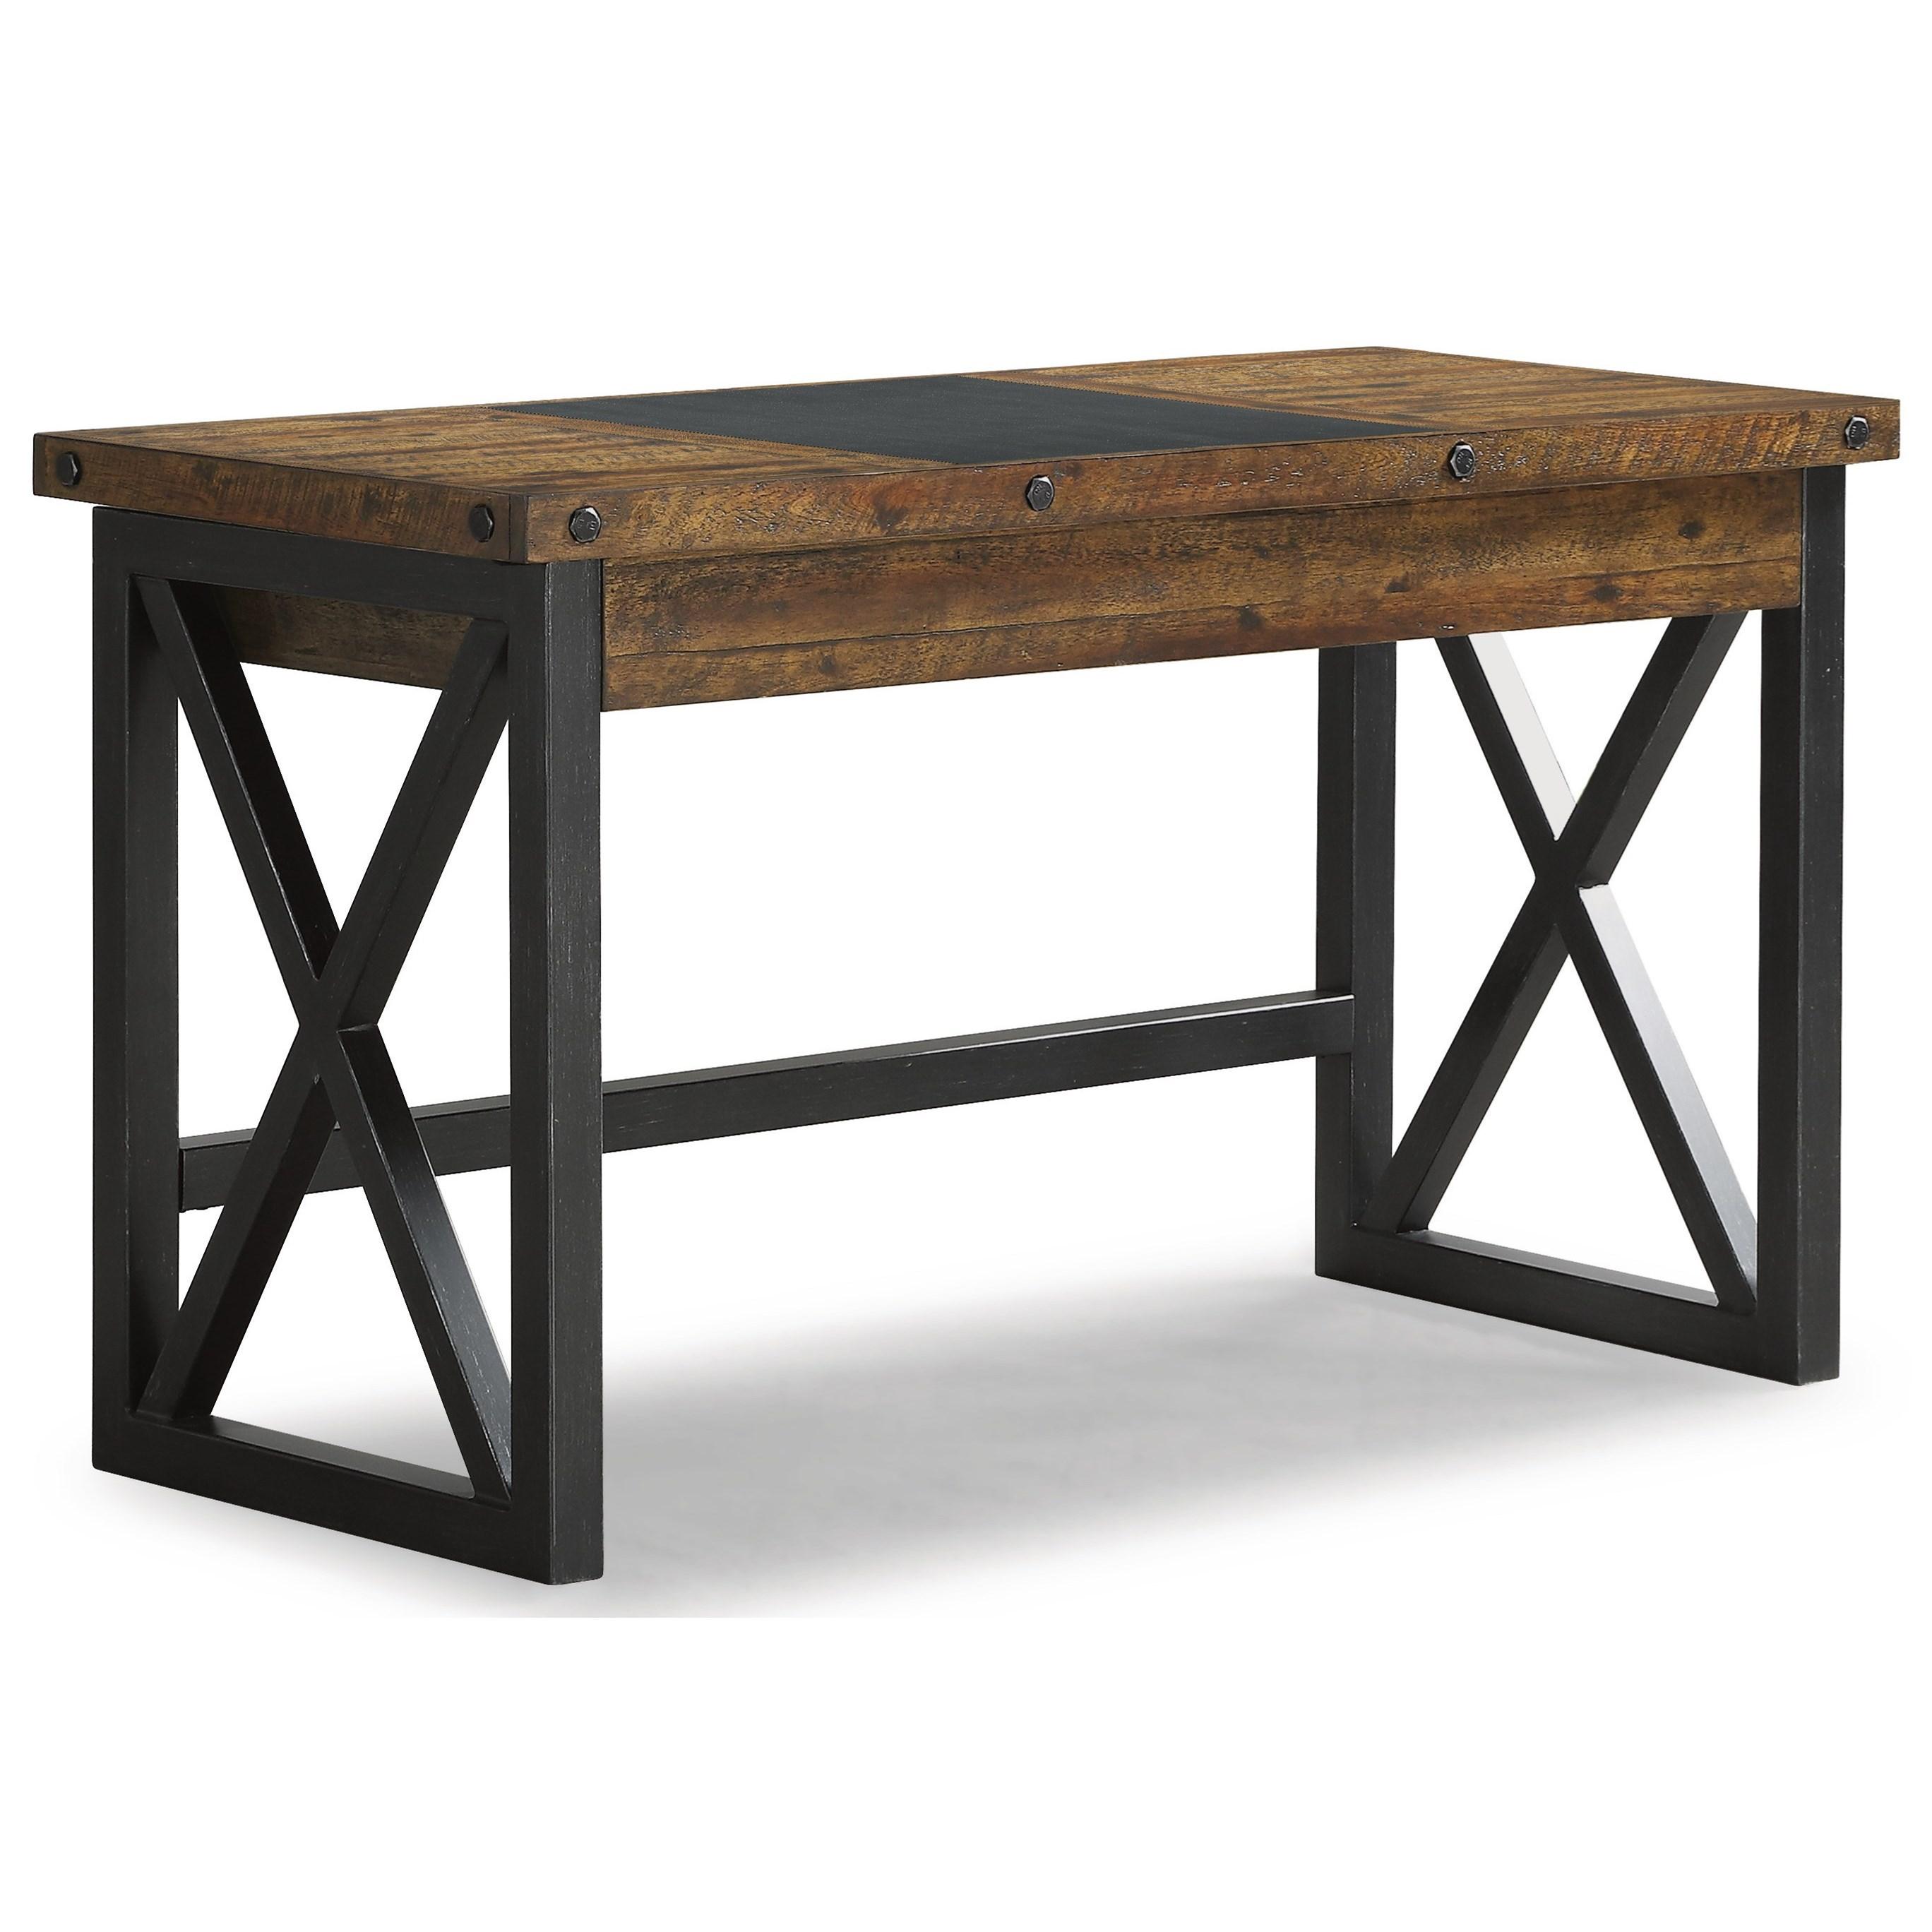 Hammermill Lift-Top Desk by Flexsteel at Crowley Furniture & Mattress